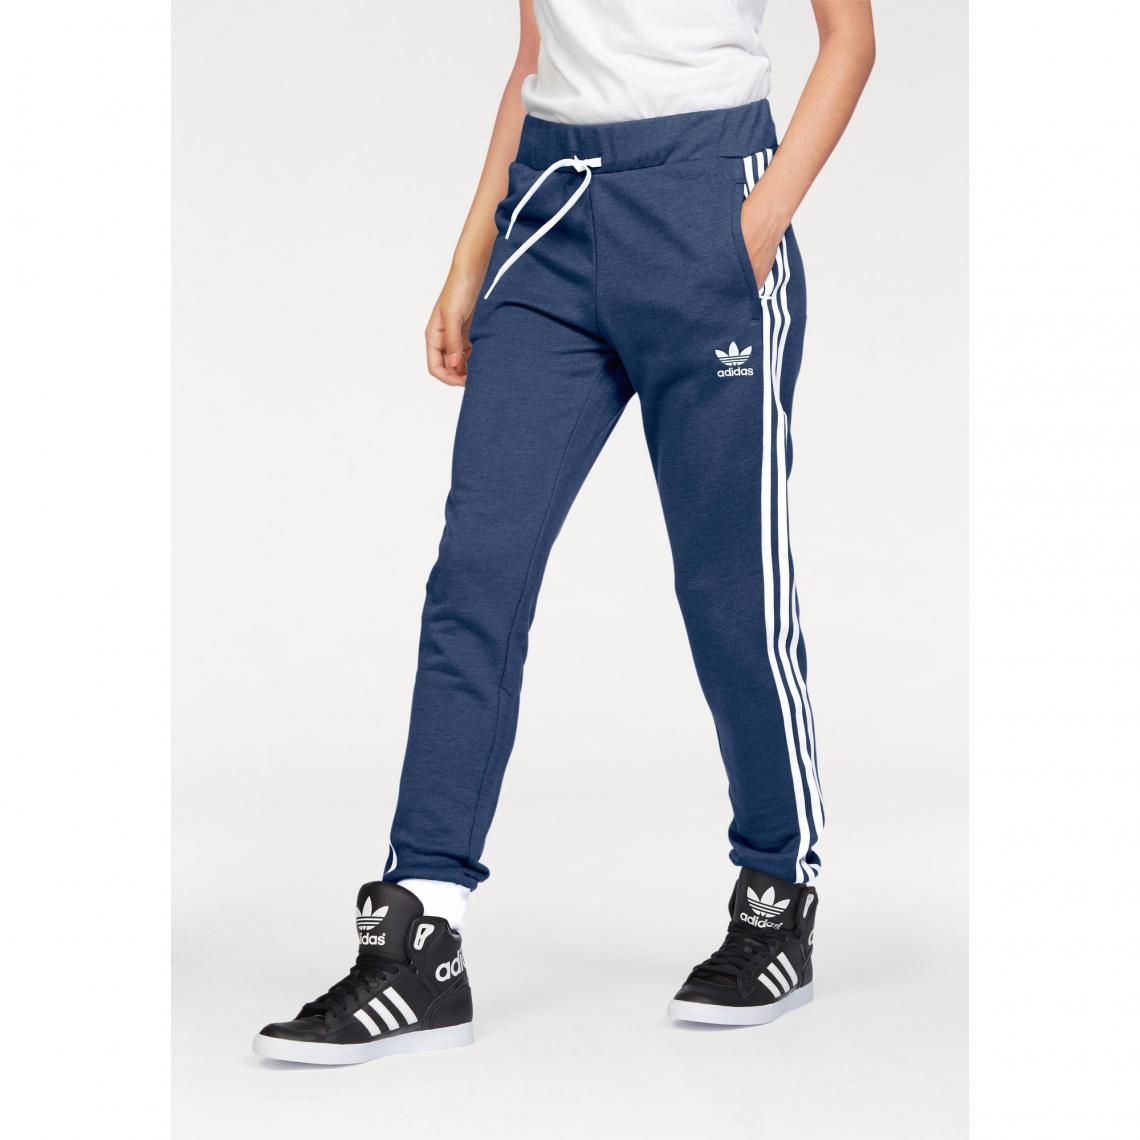 pantalon adidas homme original